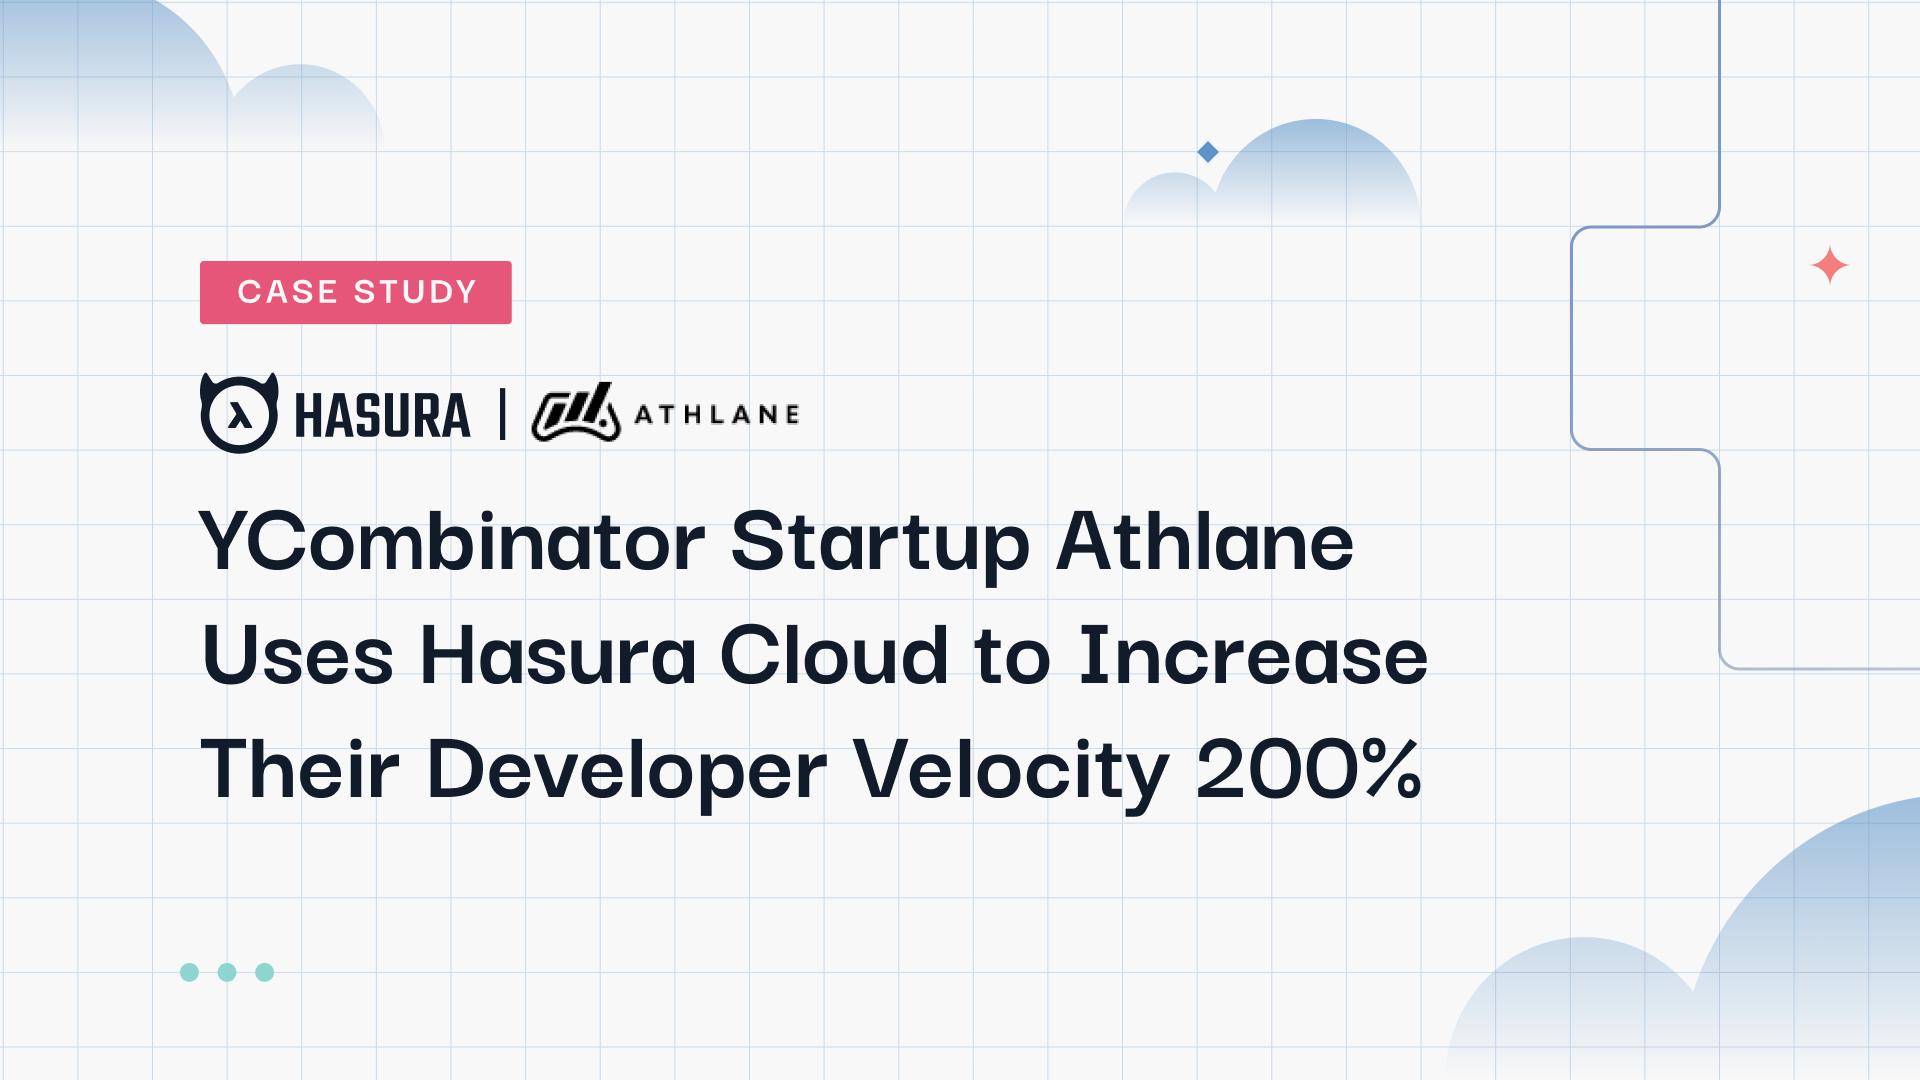 Case Study: YCombinator Startup Athlane Uses Hasura Cloud to Increase Their Developer Velocity 200%